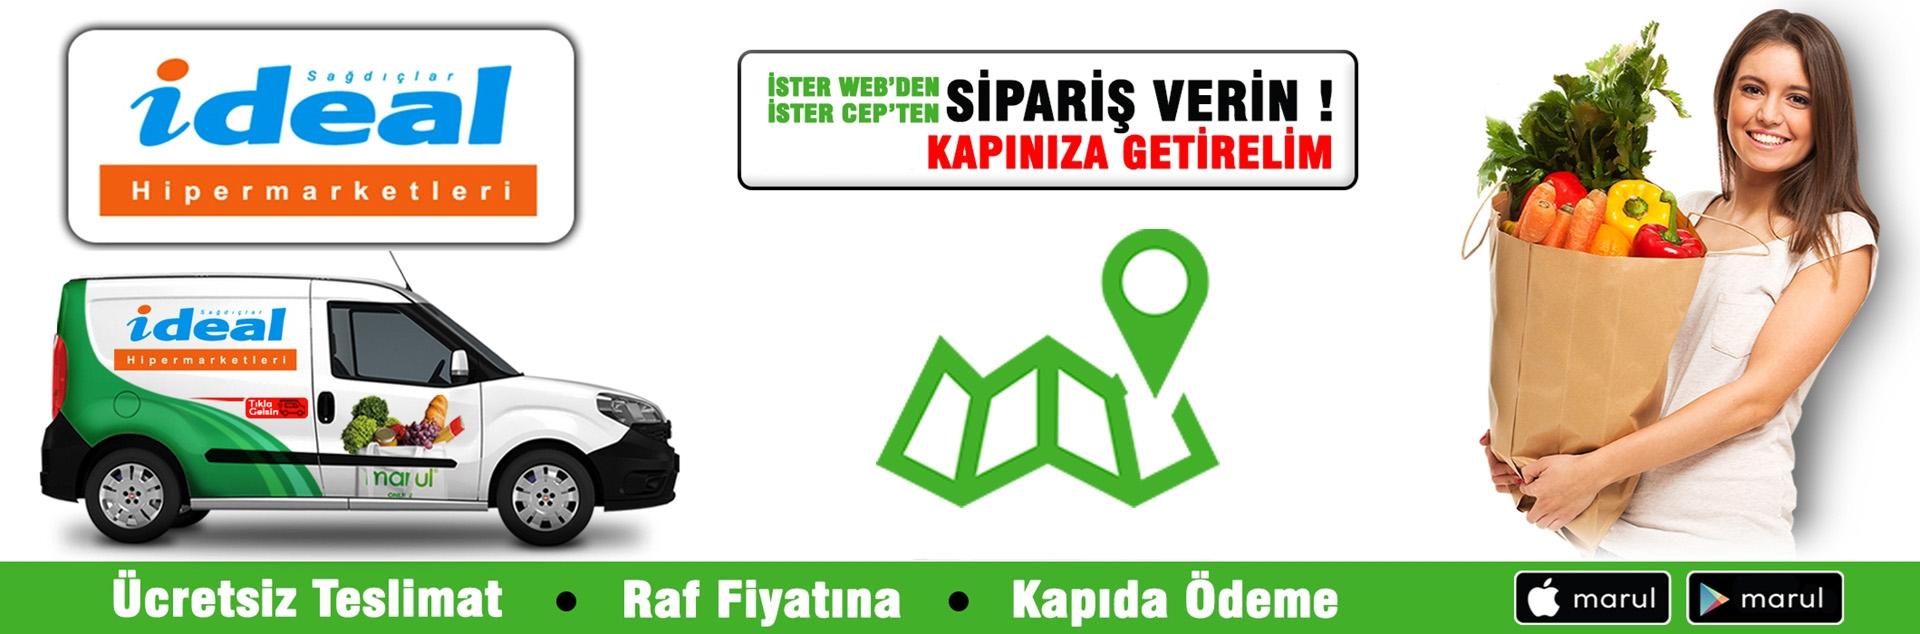 kadıköy ideal market online sipariş